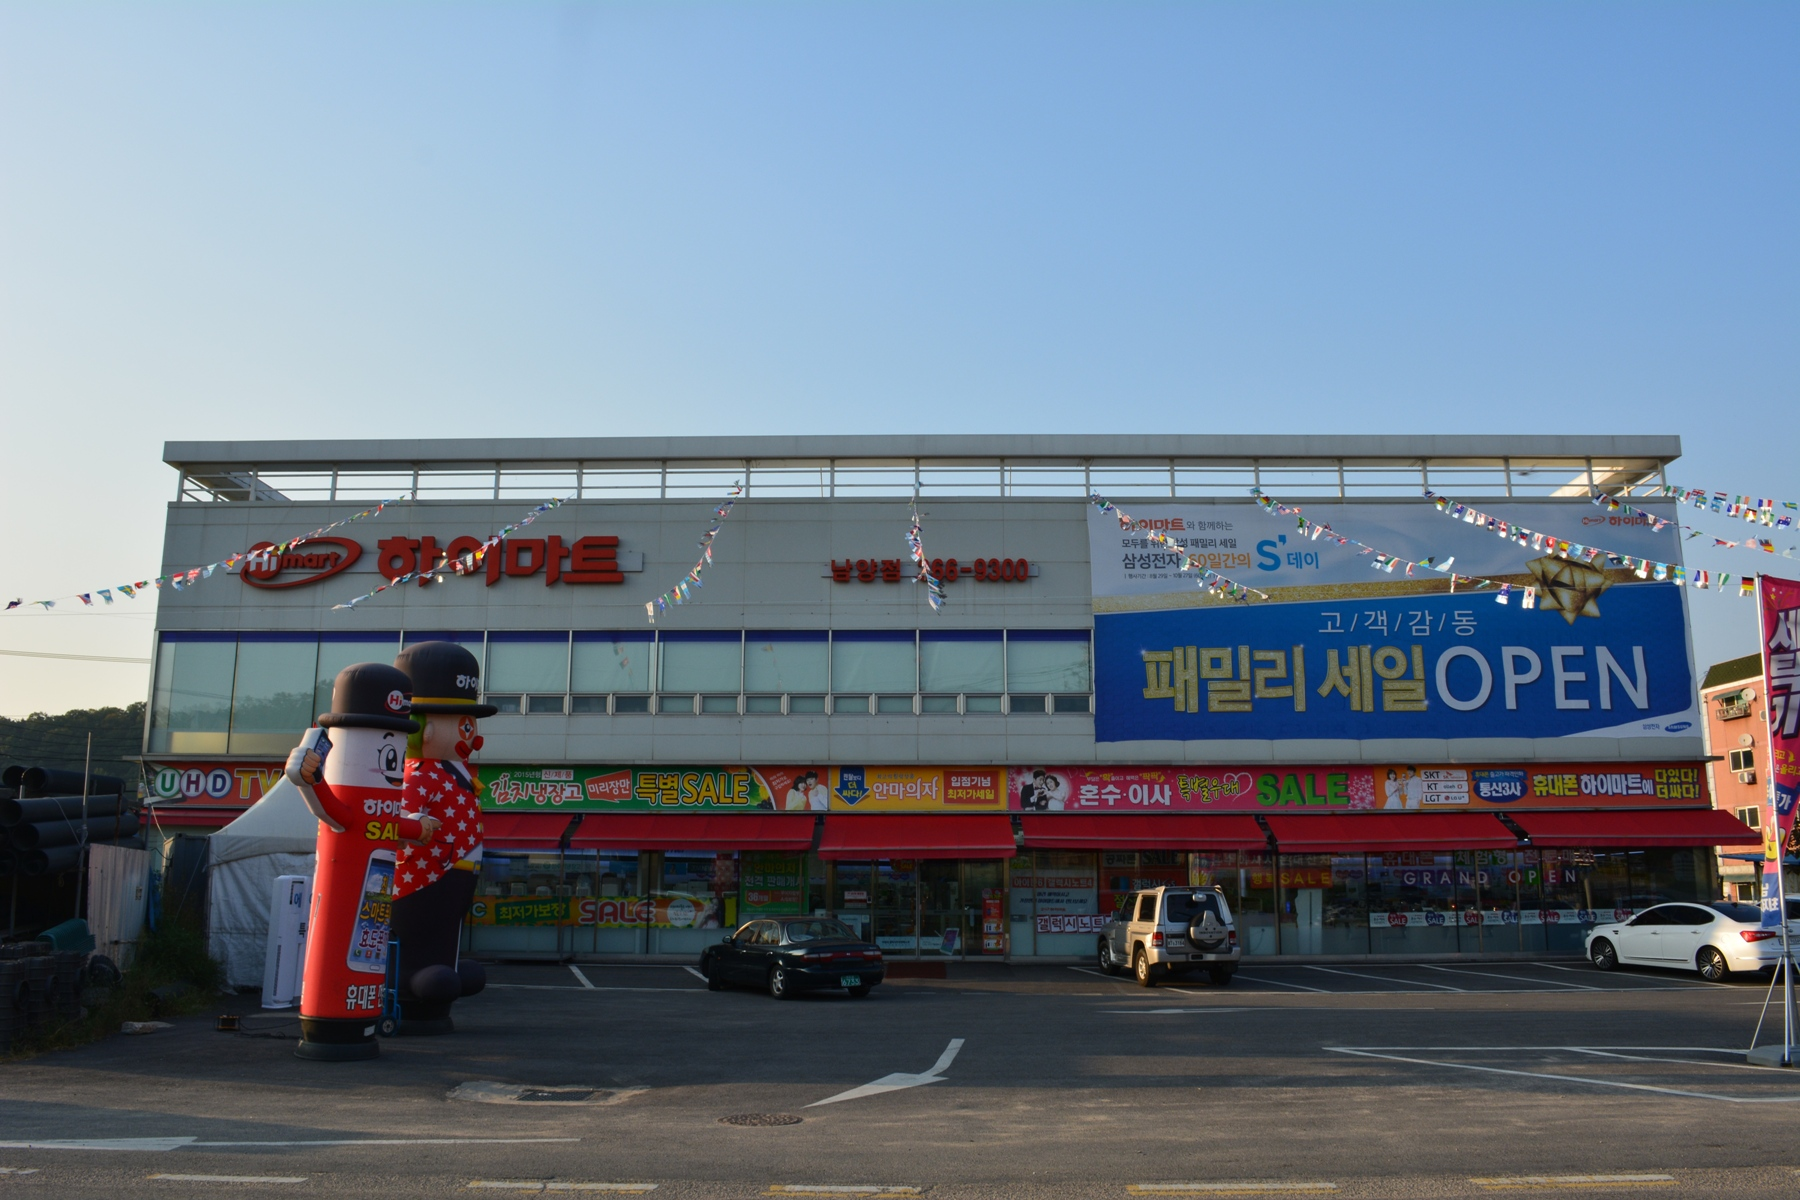 Lotte Hi-mart – Namyang Branch (롯데 하이마트 (남양점))